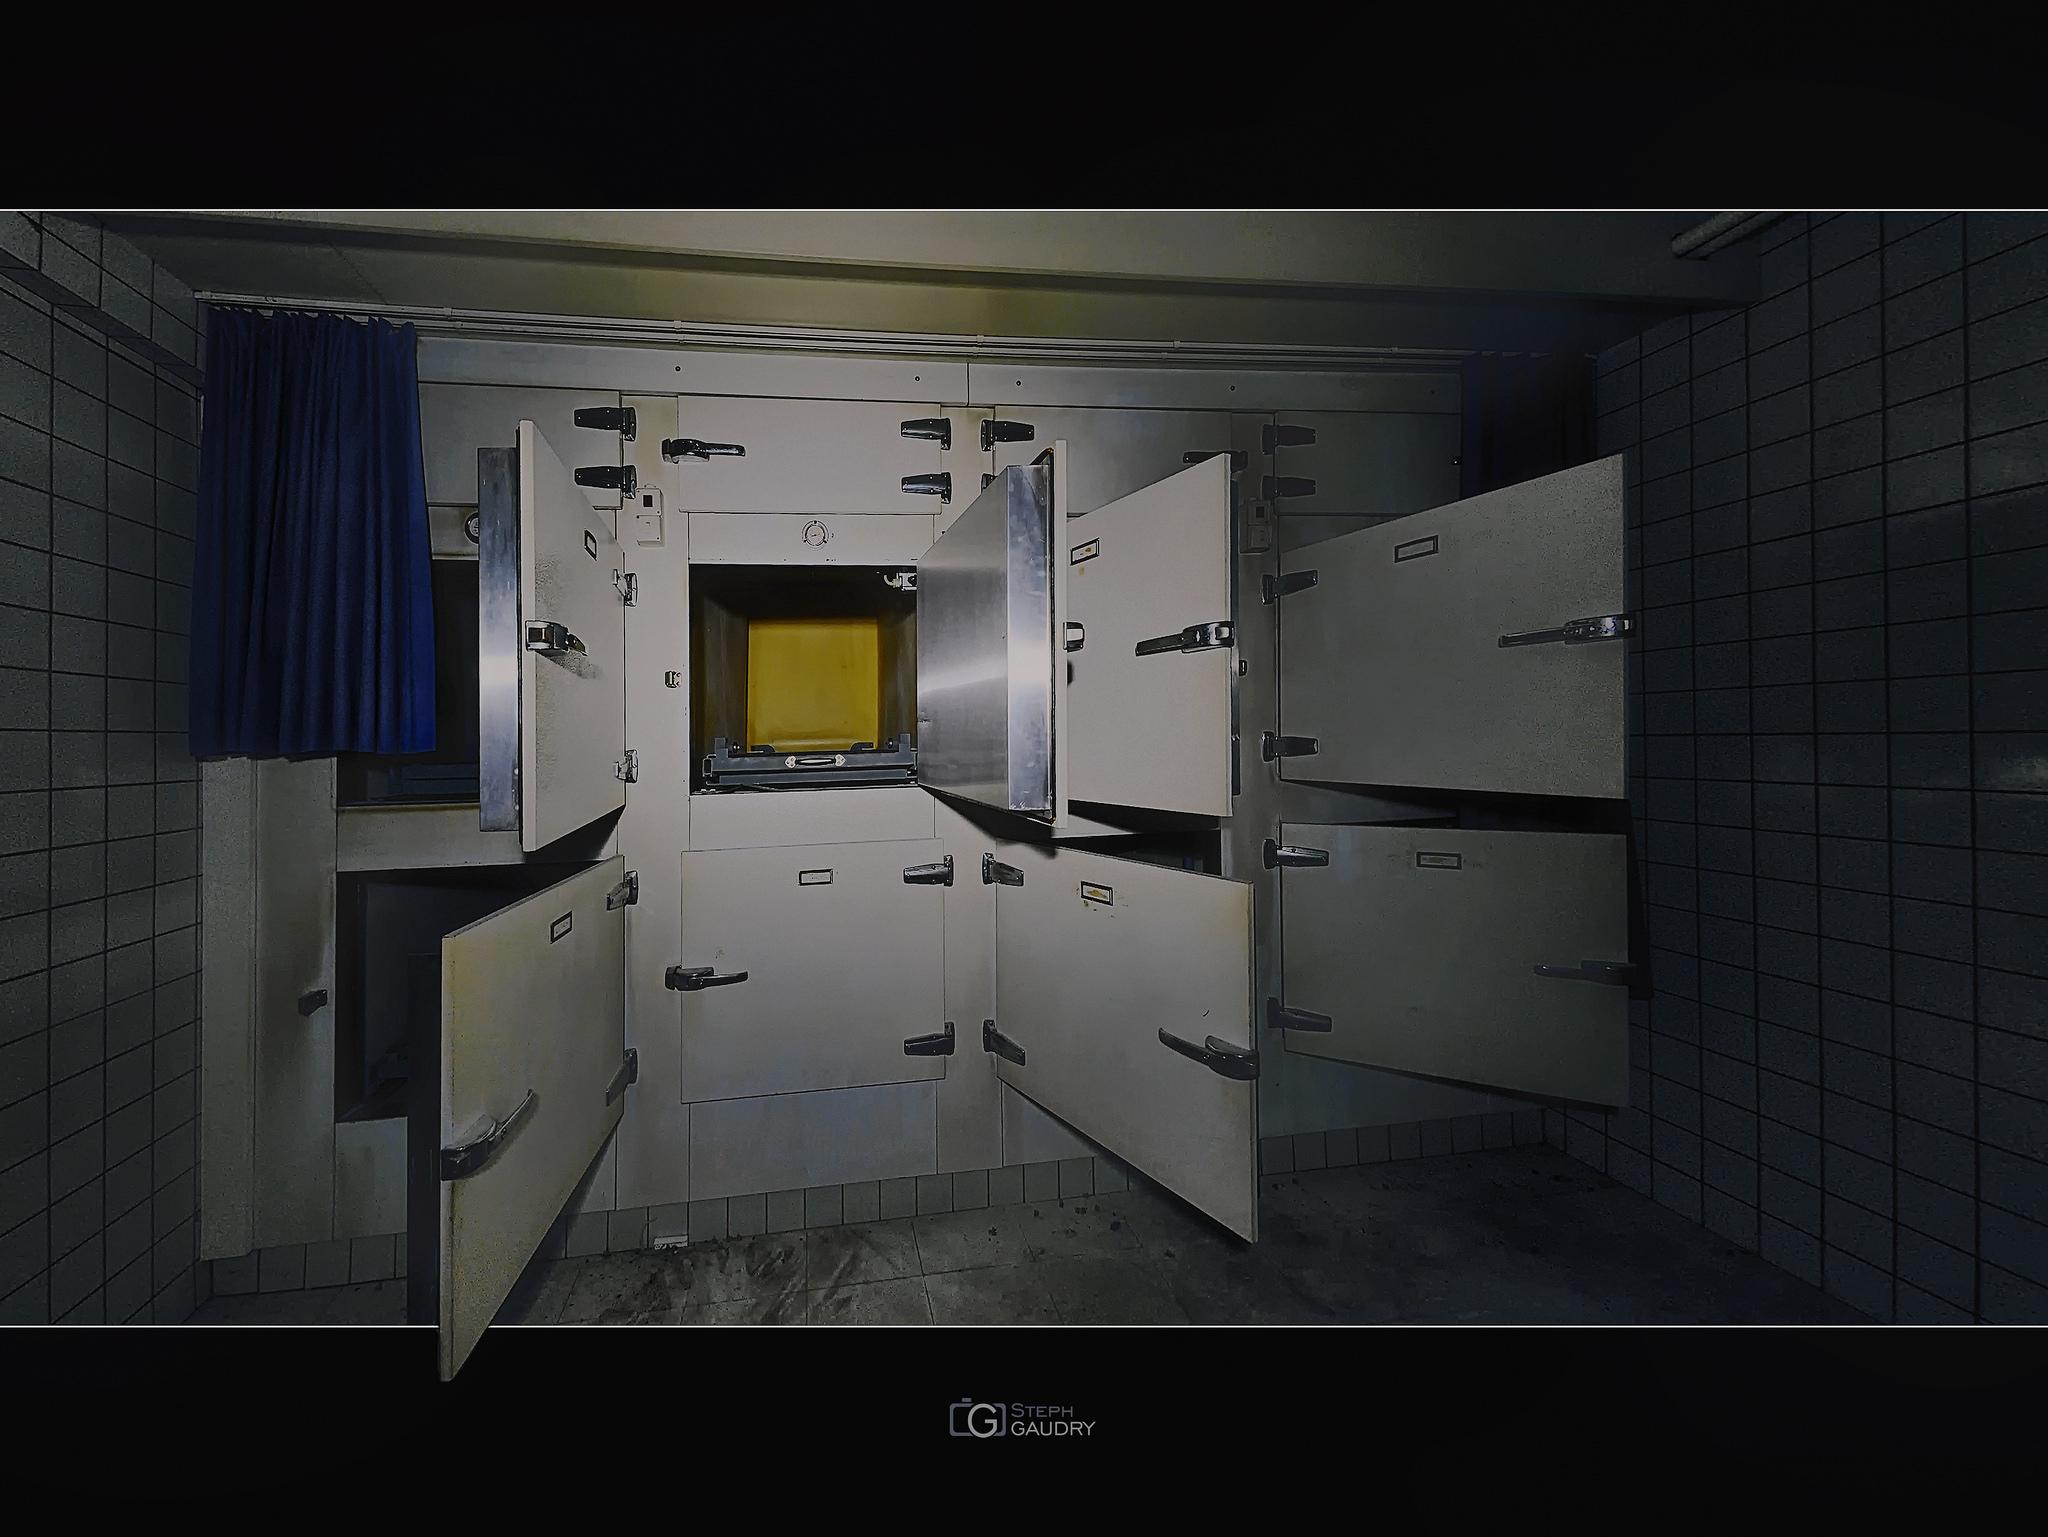 La morgue [Click to start slideshow]